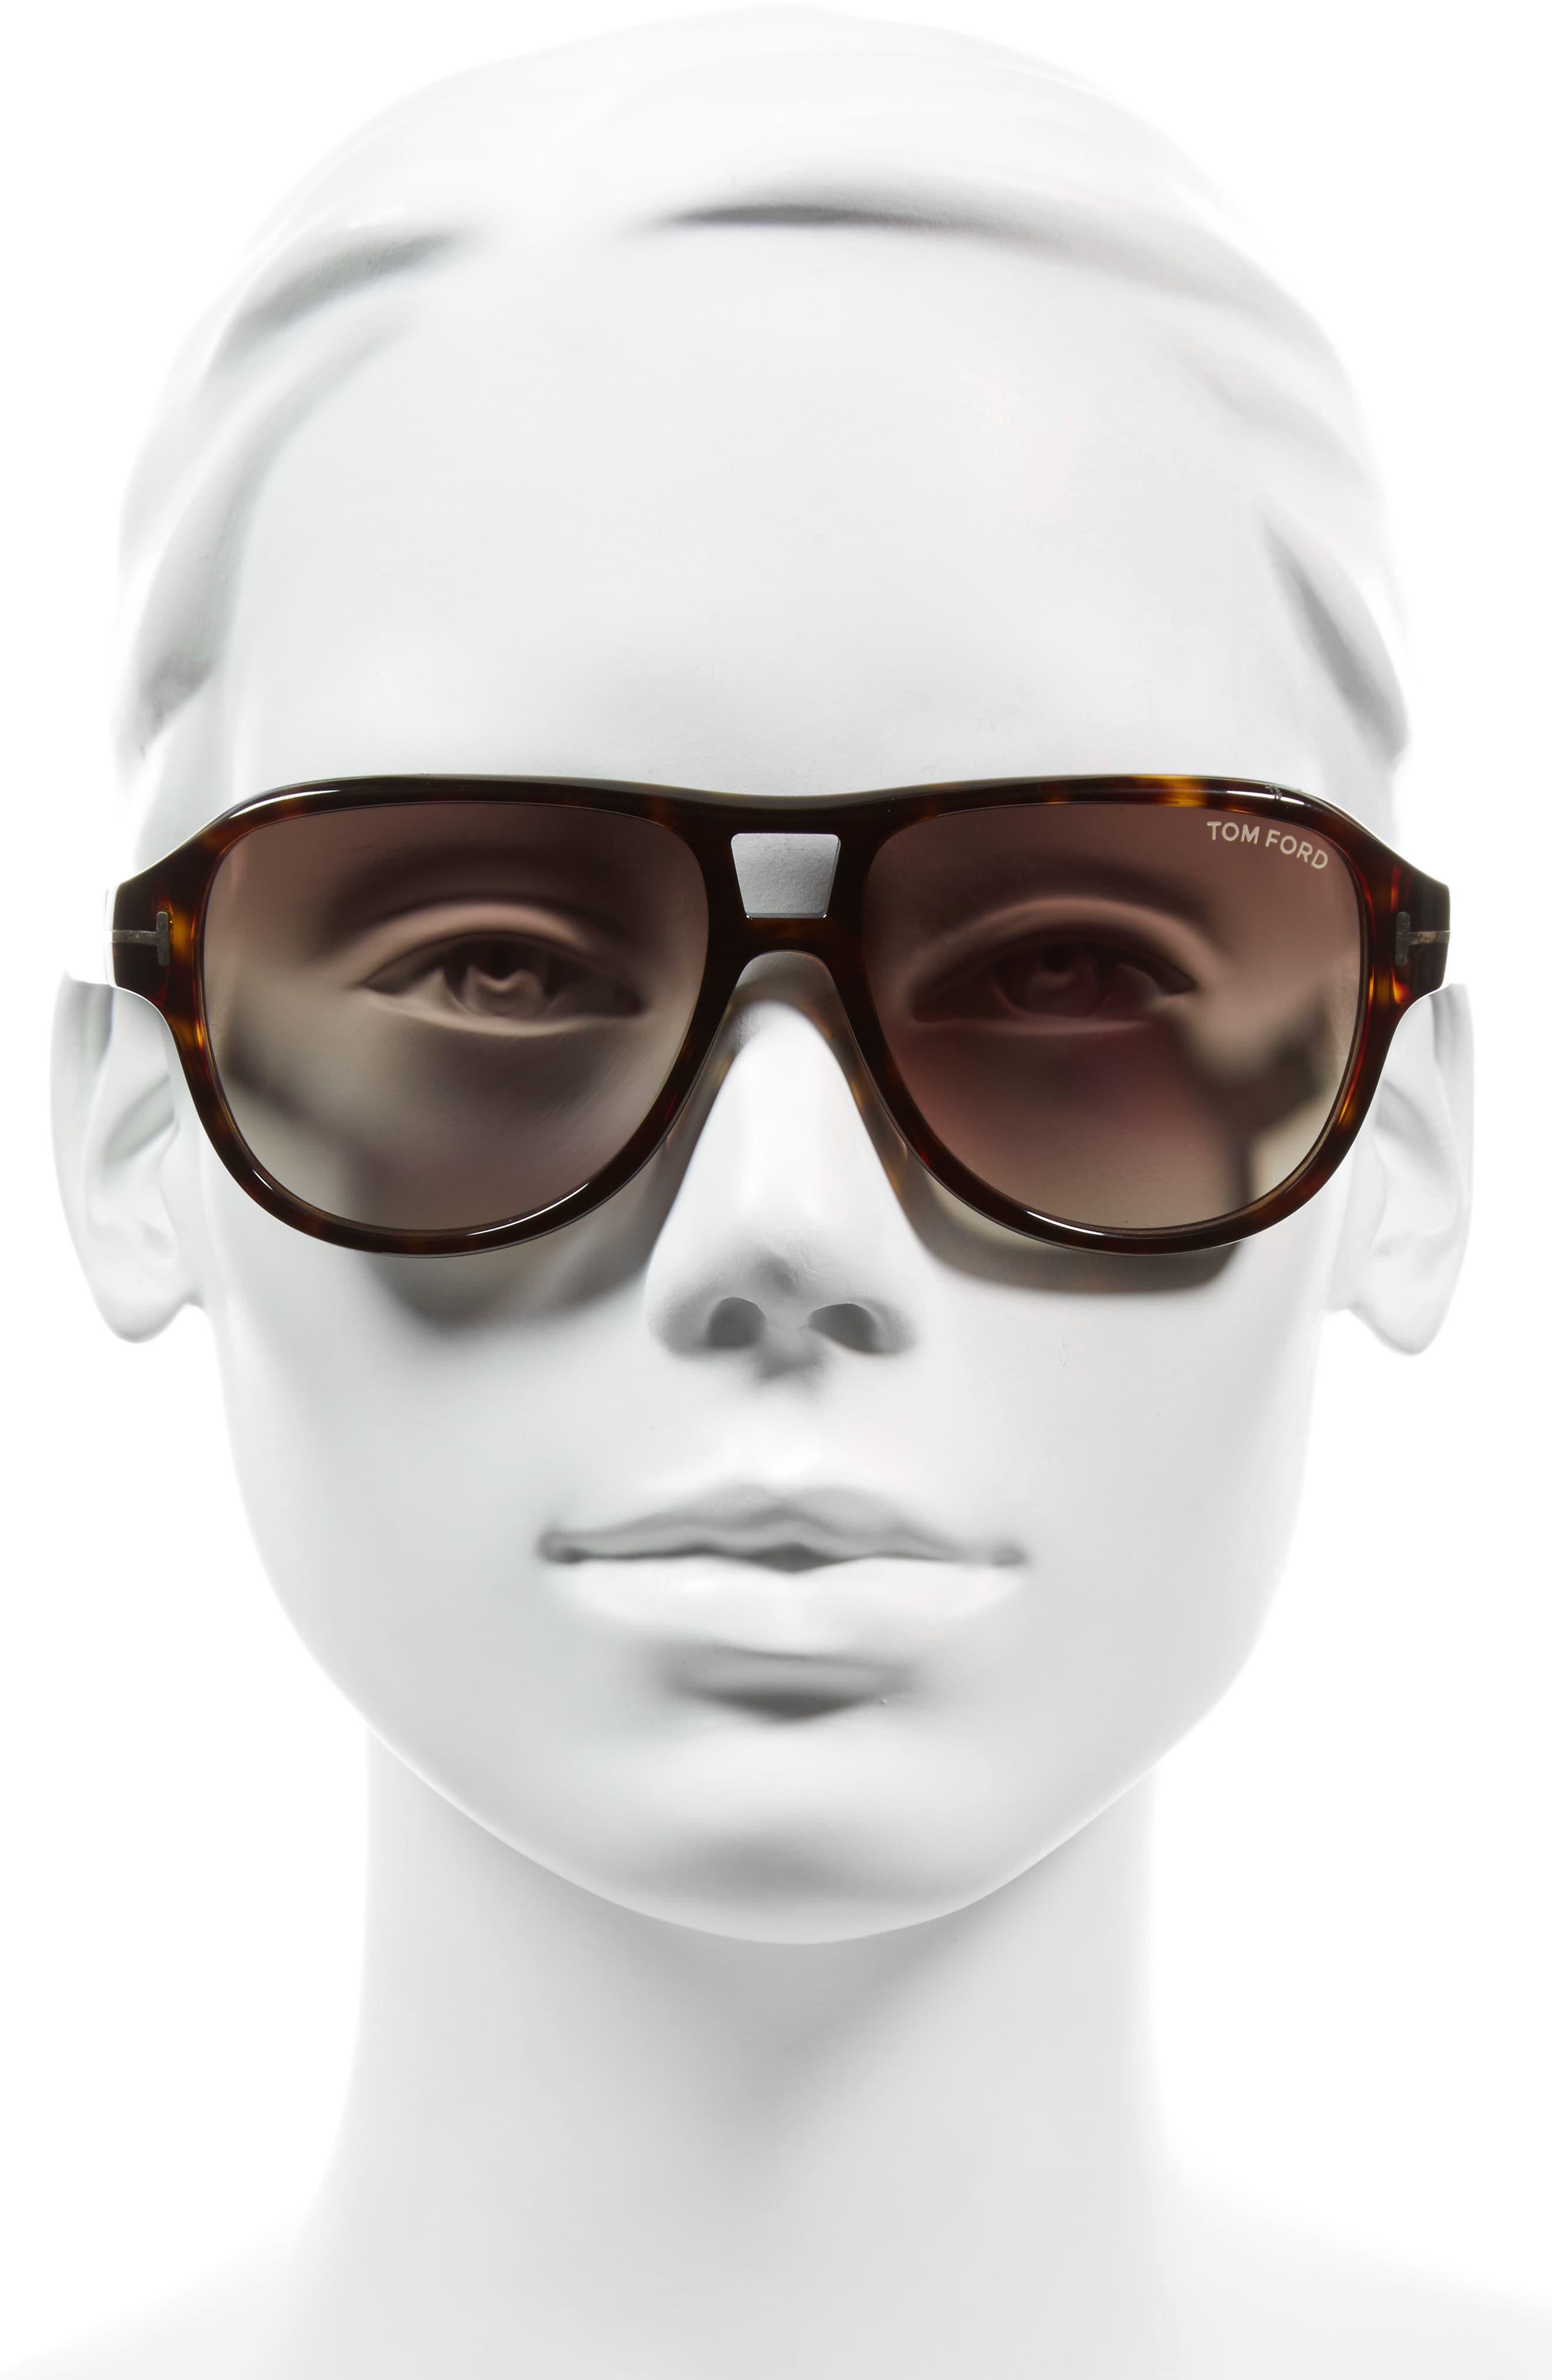 Philippa 55mm Gradient Round Aviator Sunglasses,                             Alternate thumbnail 2, color,                             001